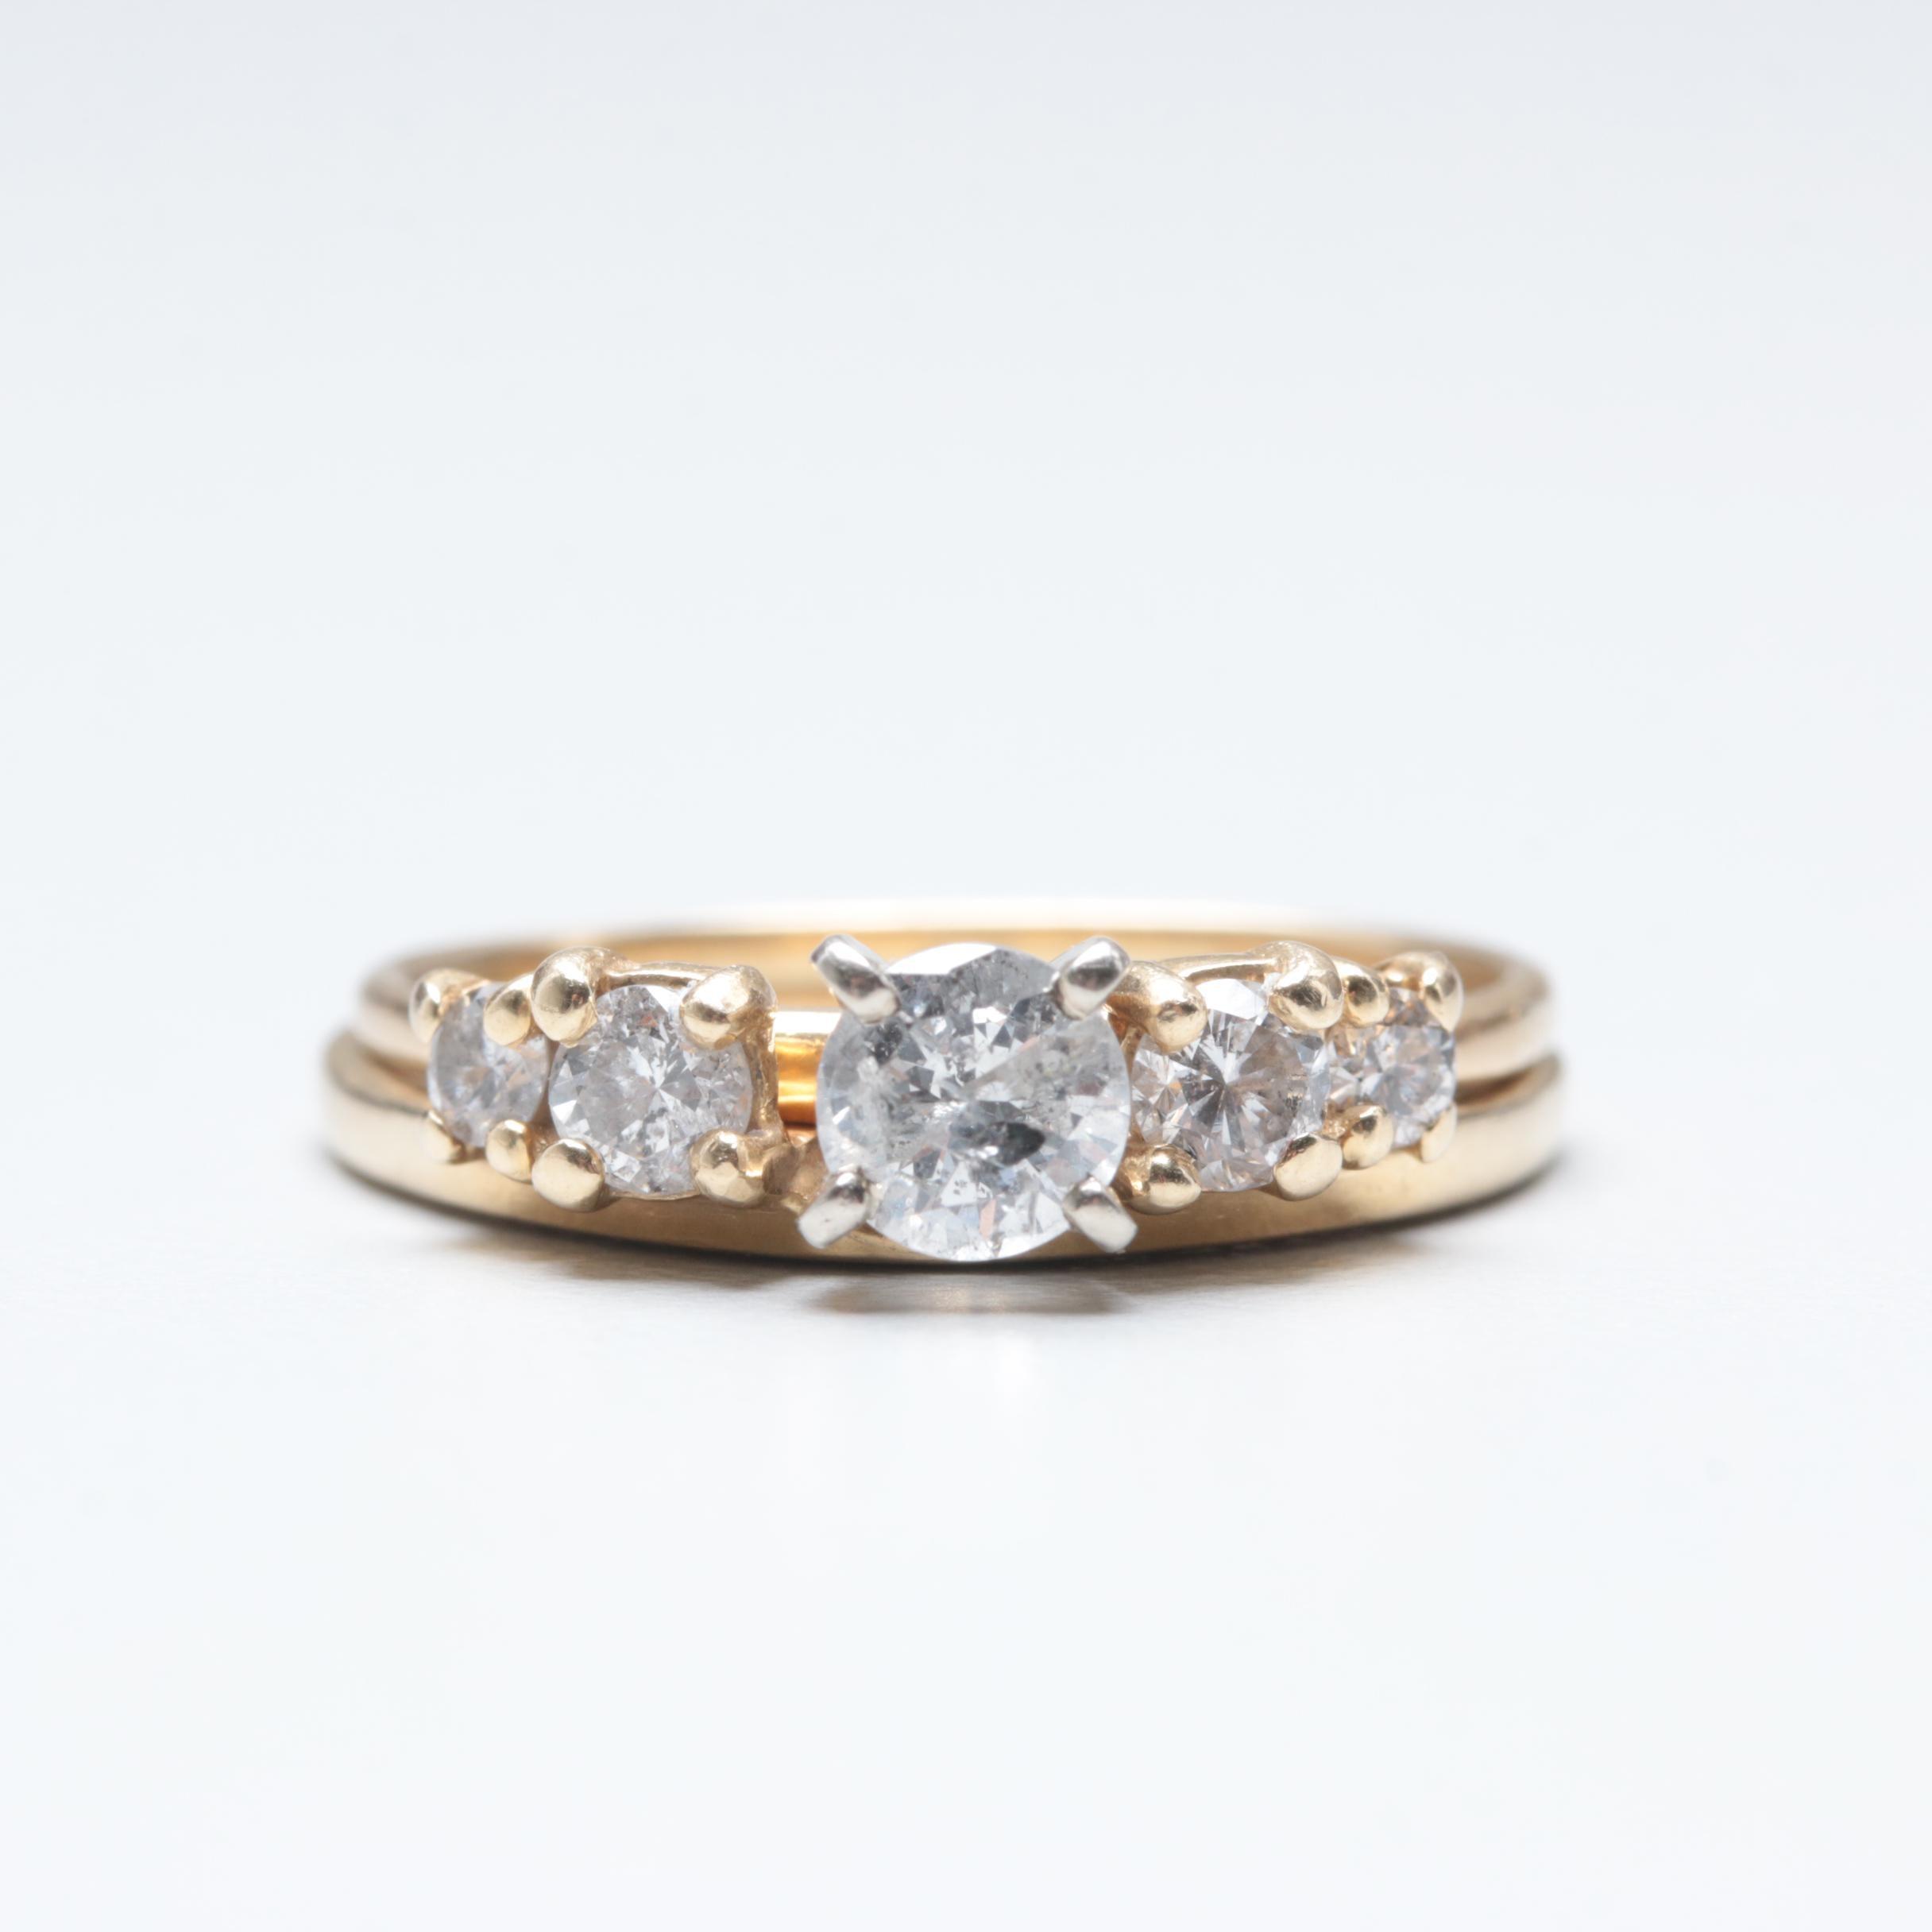 14K Yellow Gold Diamond Wedding Ring Set